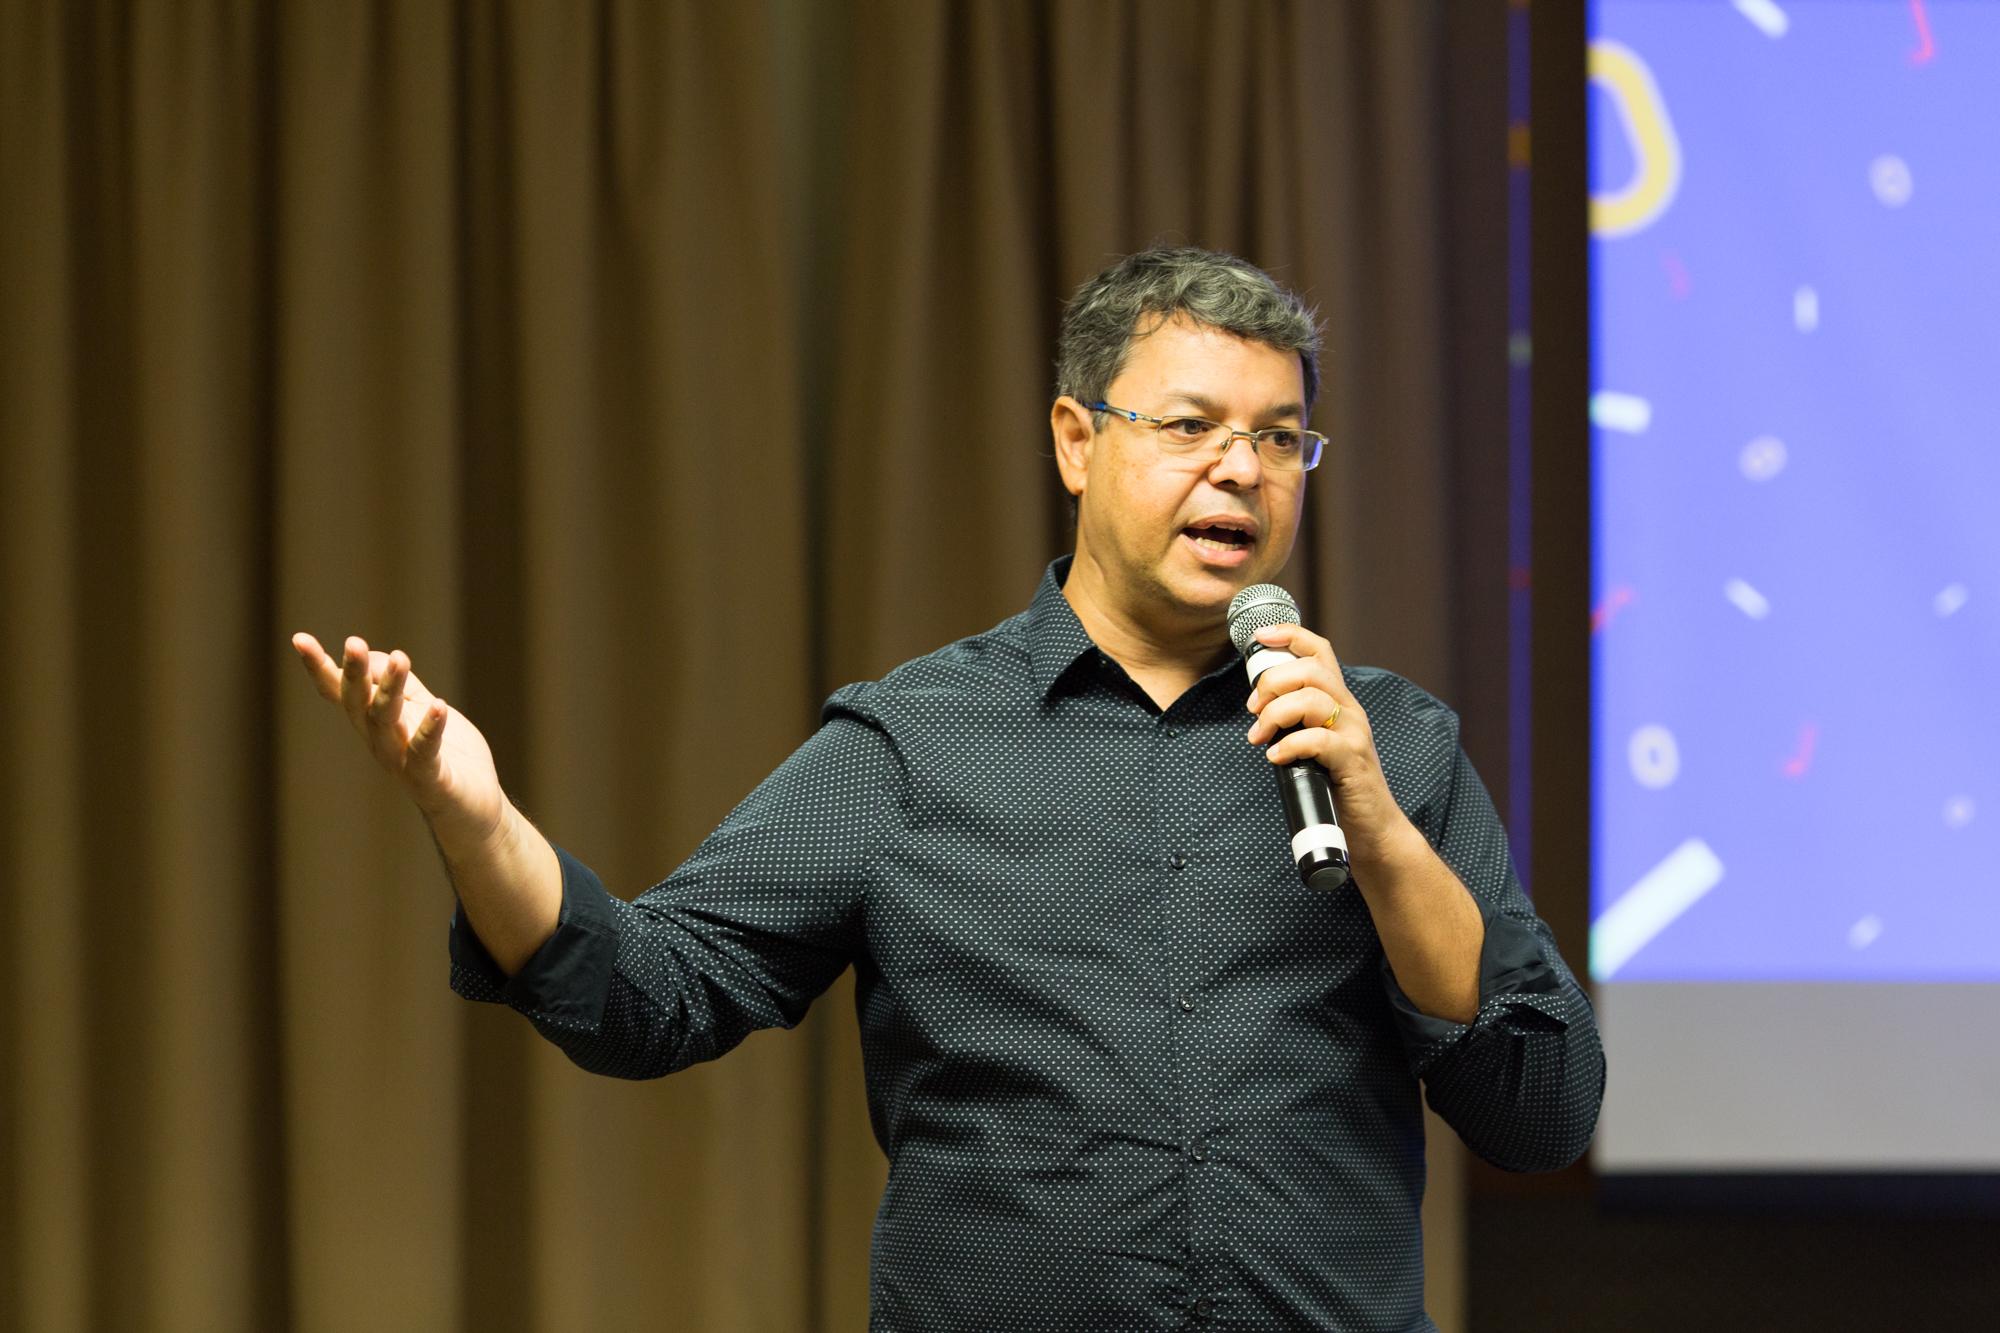 Vanderson Berbat, diretor do Impulsiona